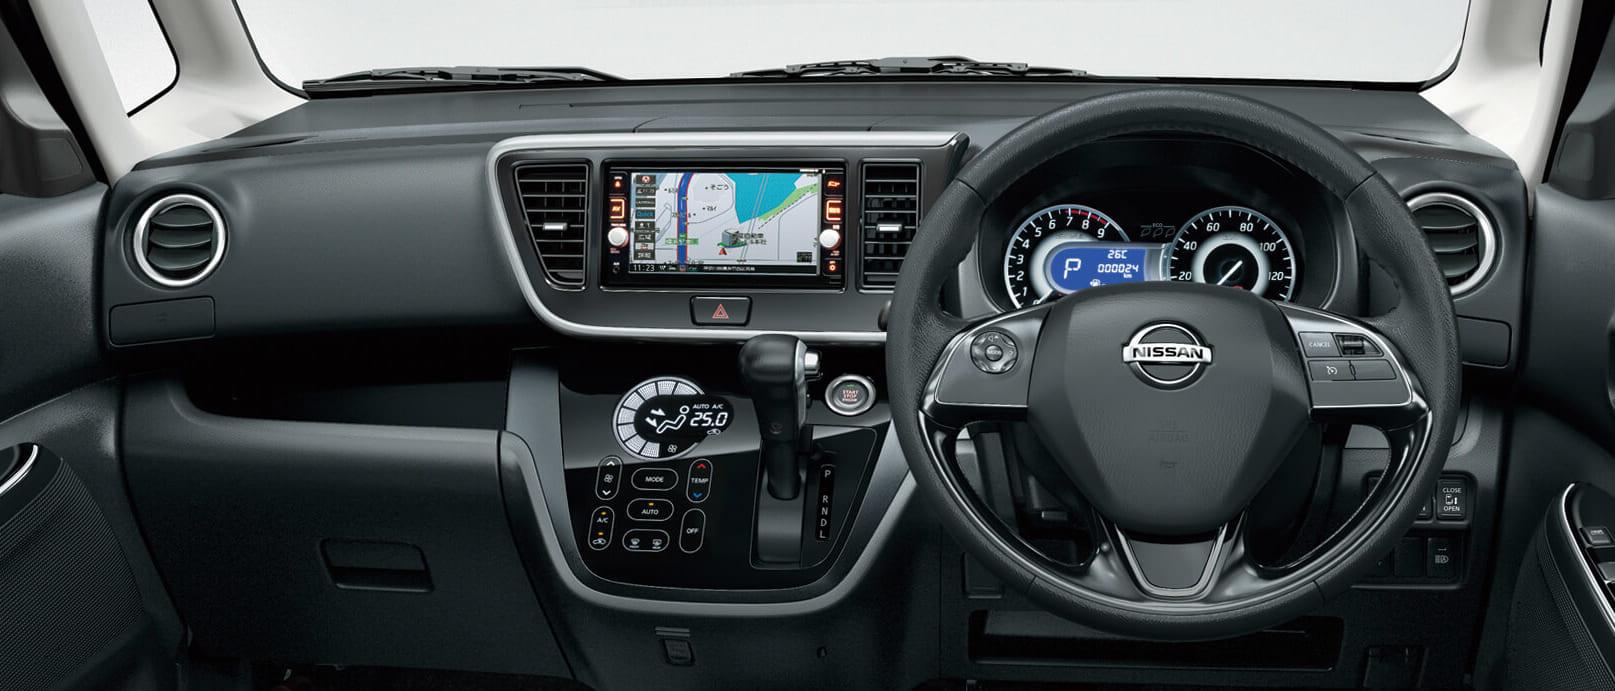 Nissan_DAYZ-ROOX_DBA-B21A_instrument_panel